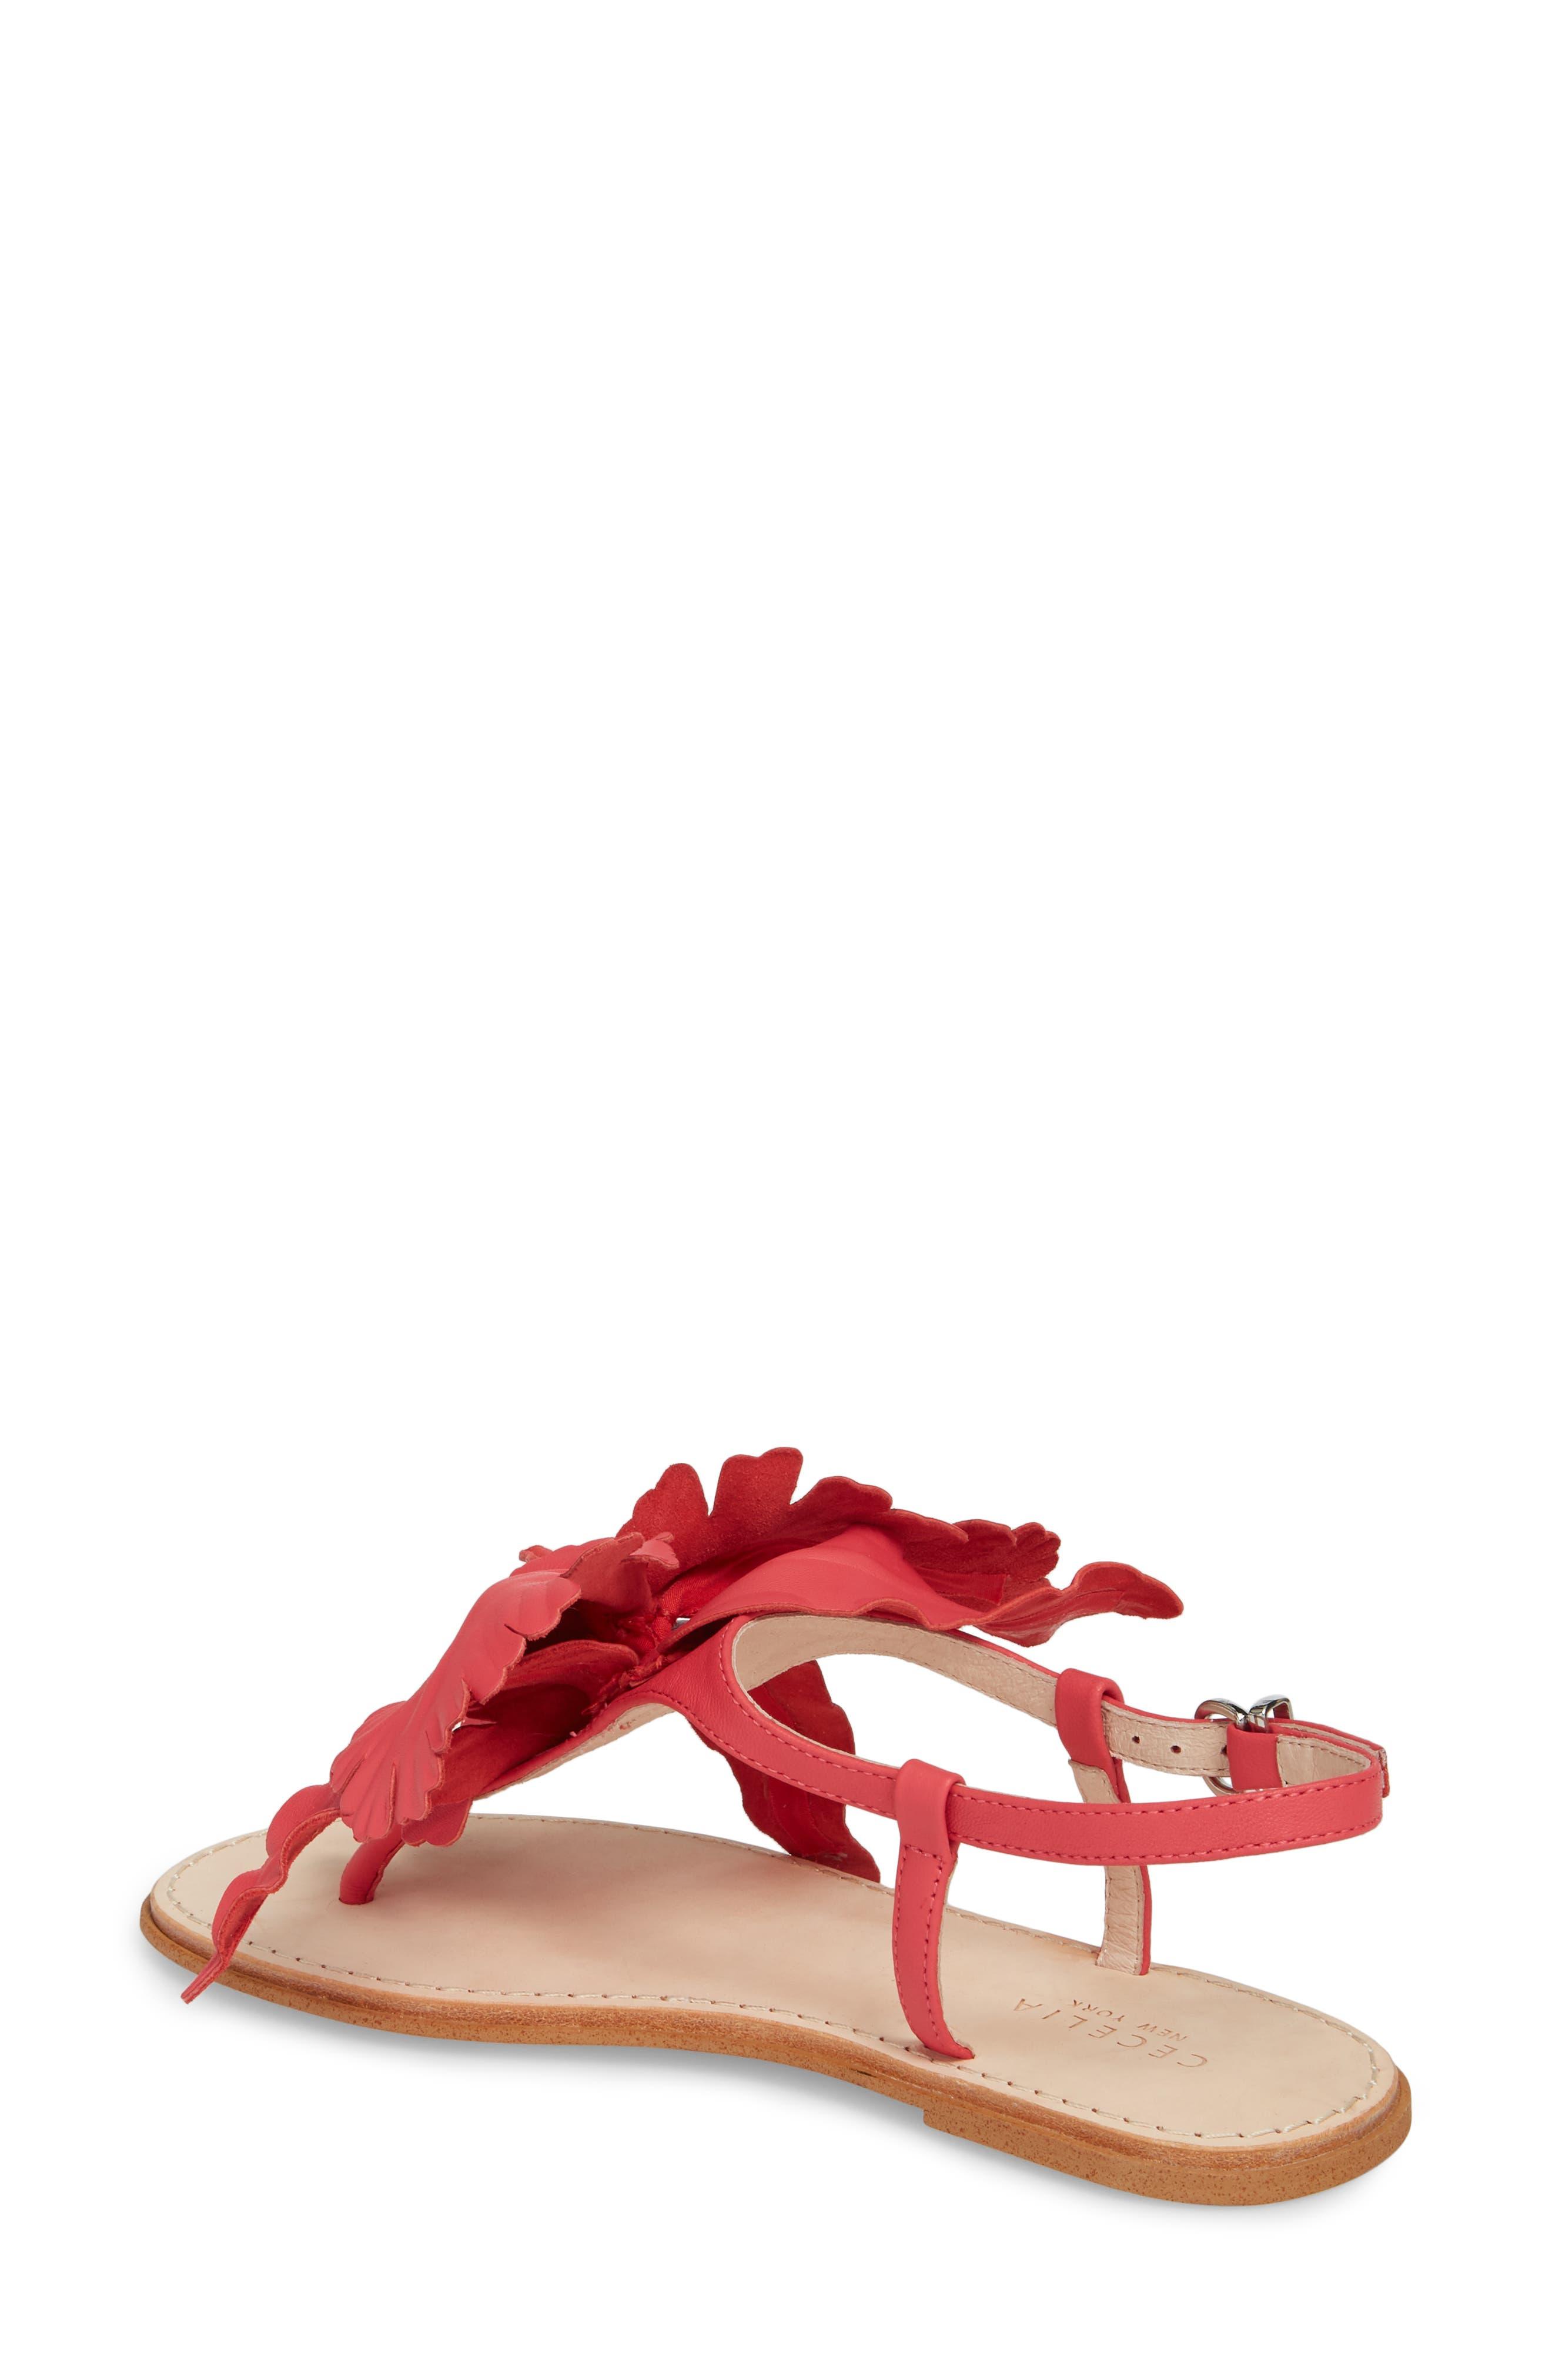 Peony Sandal,                             Alternate thumbnail 2, color,                             Fuchsia Leather